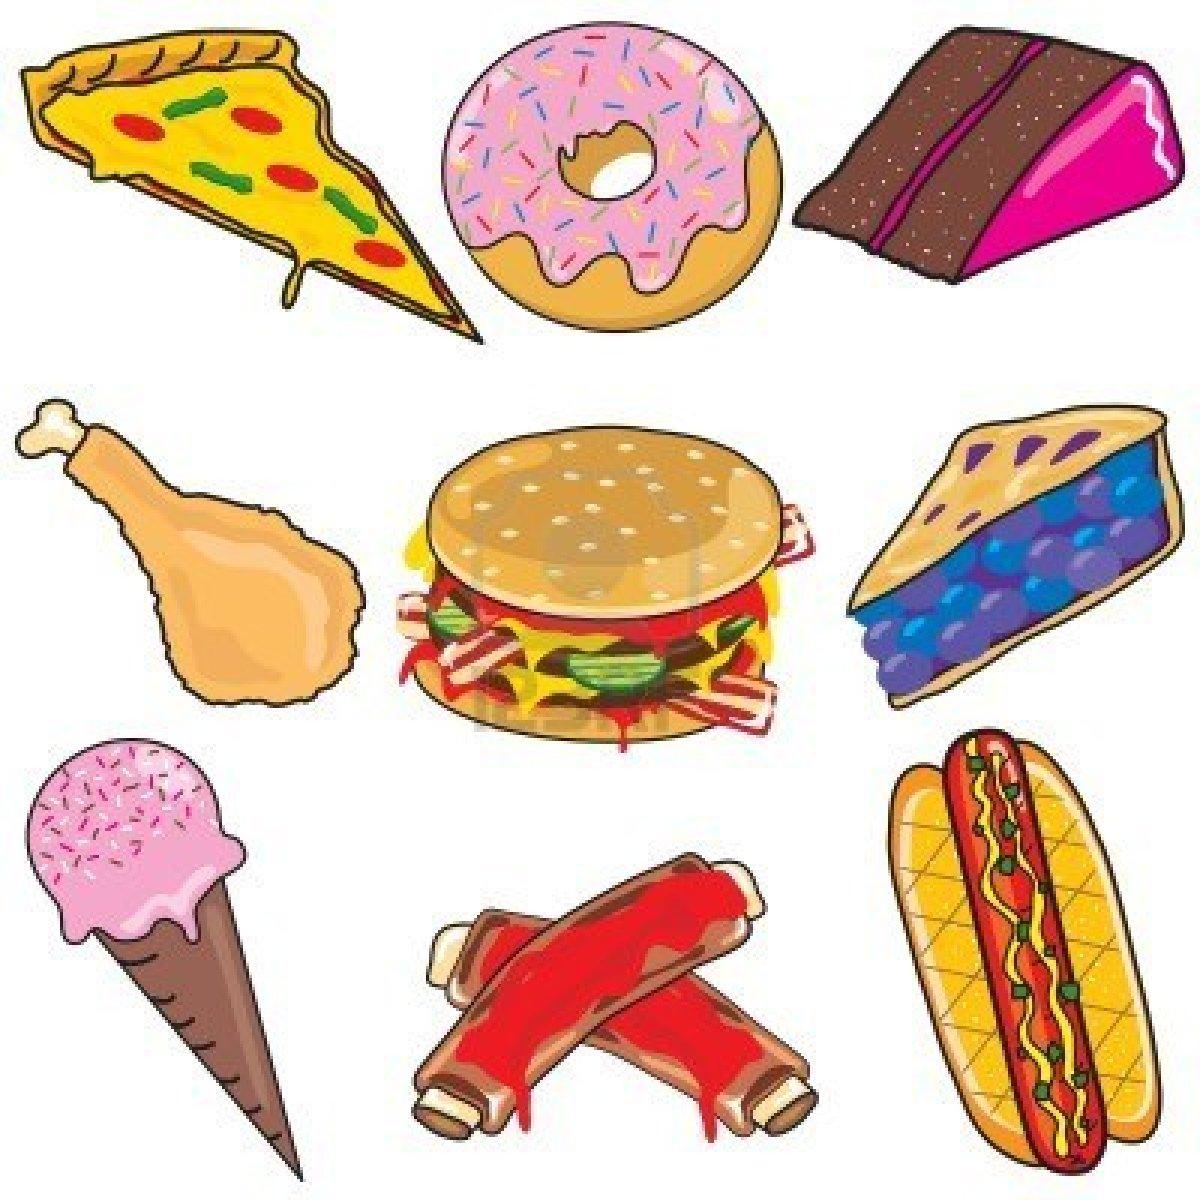 Food clip art images.